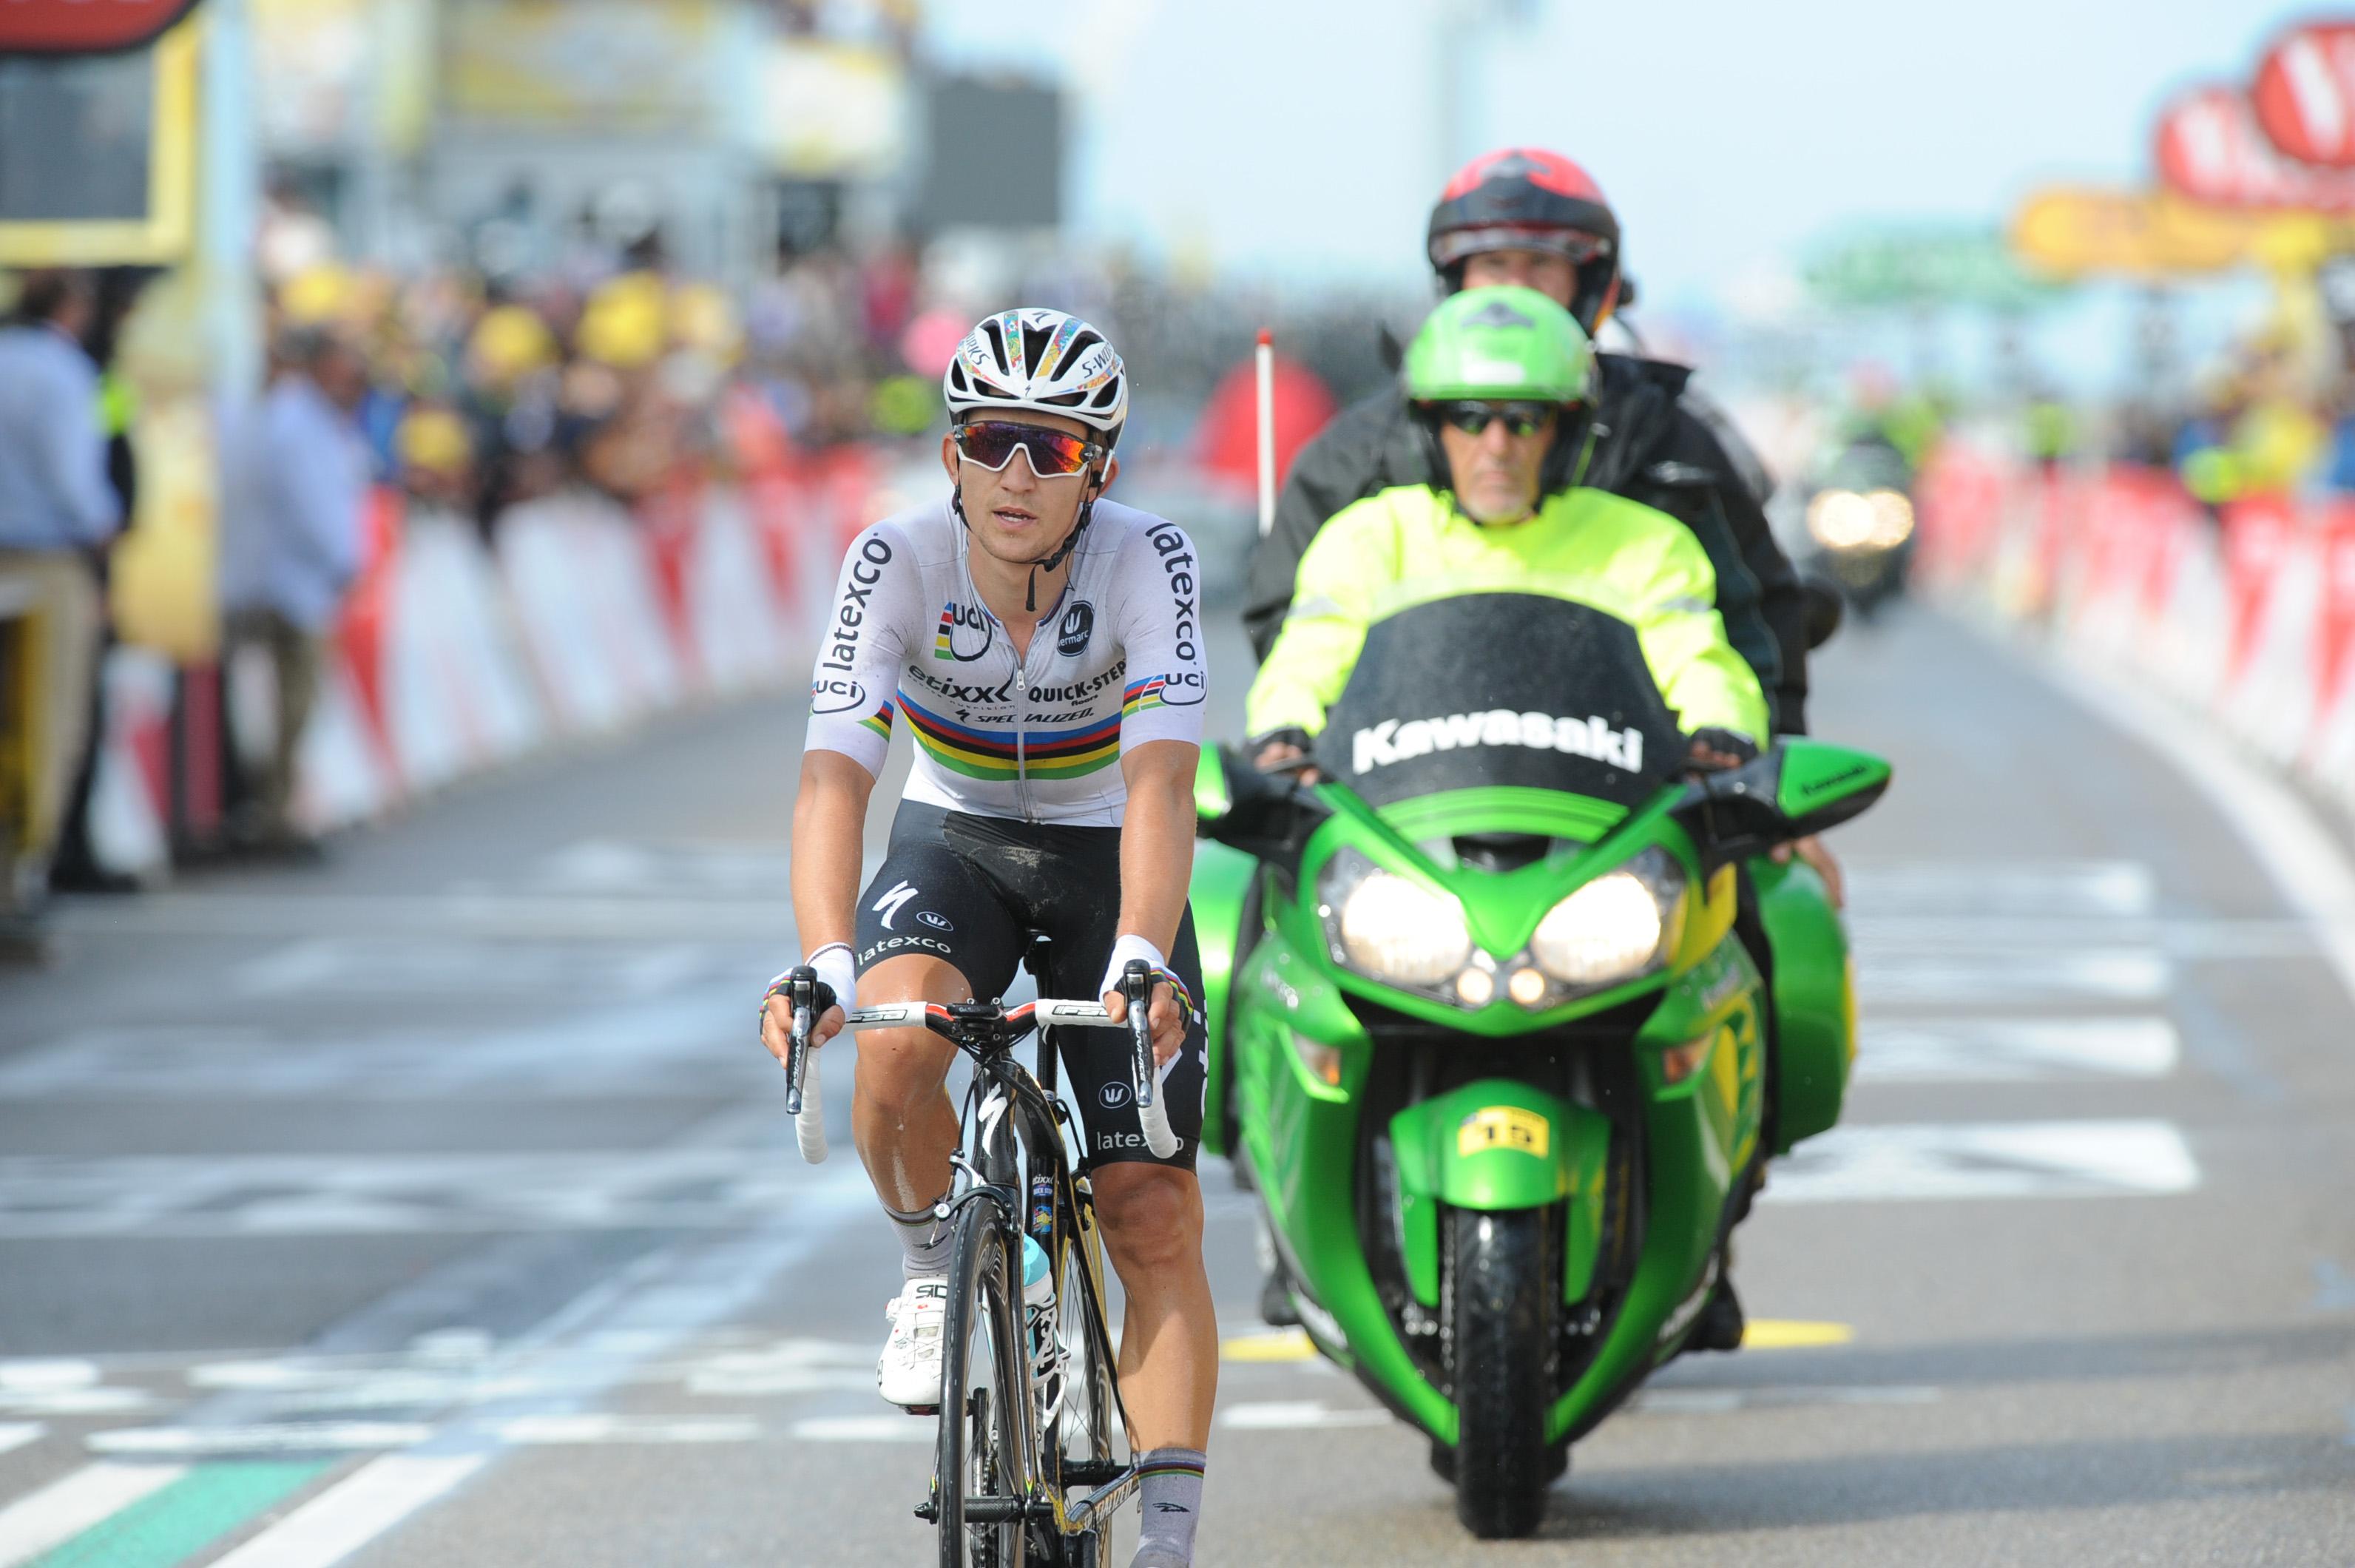 Michal Kwiatkowski bei der 2. Etappe der Tour de France 2015 im Weltmeistertrikot.